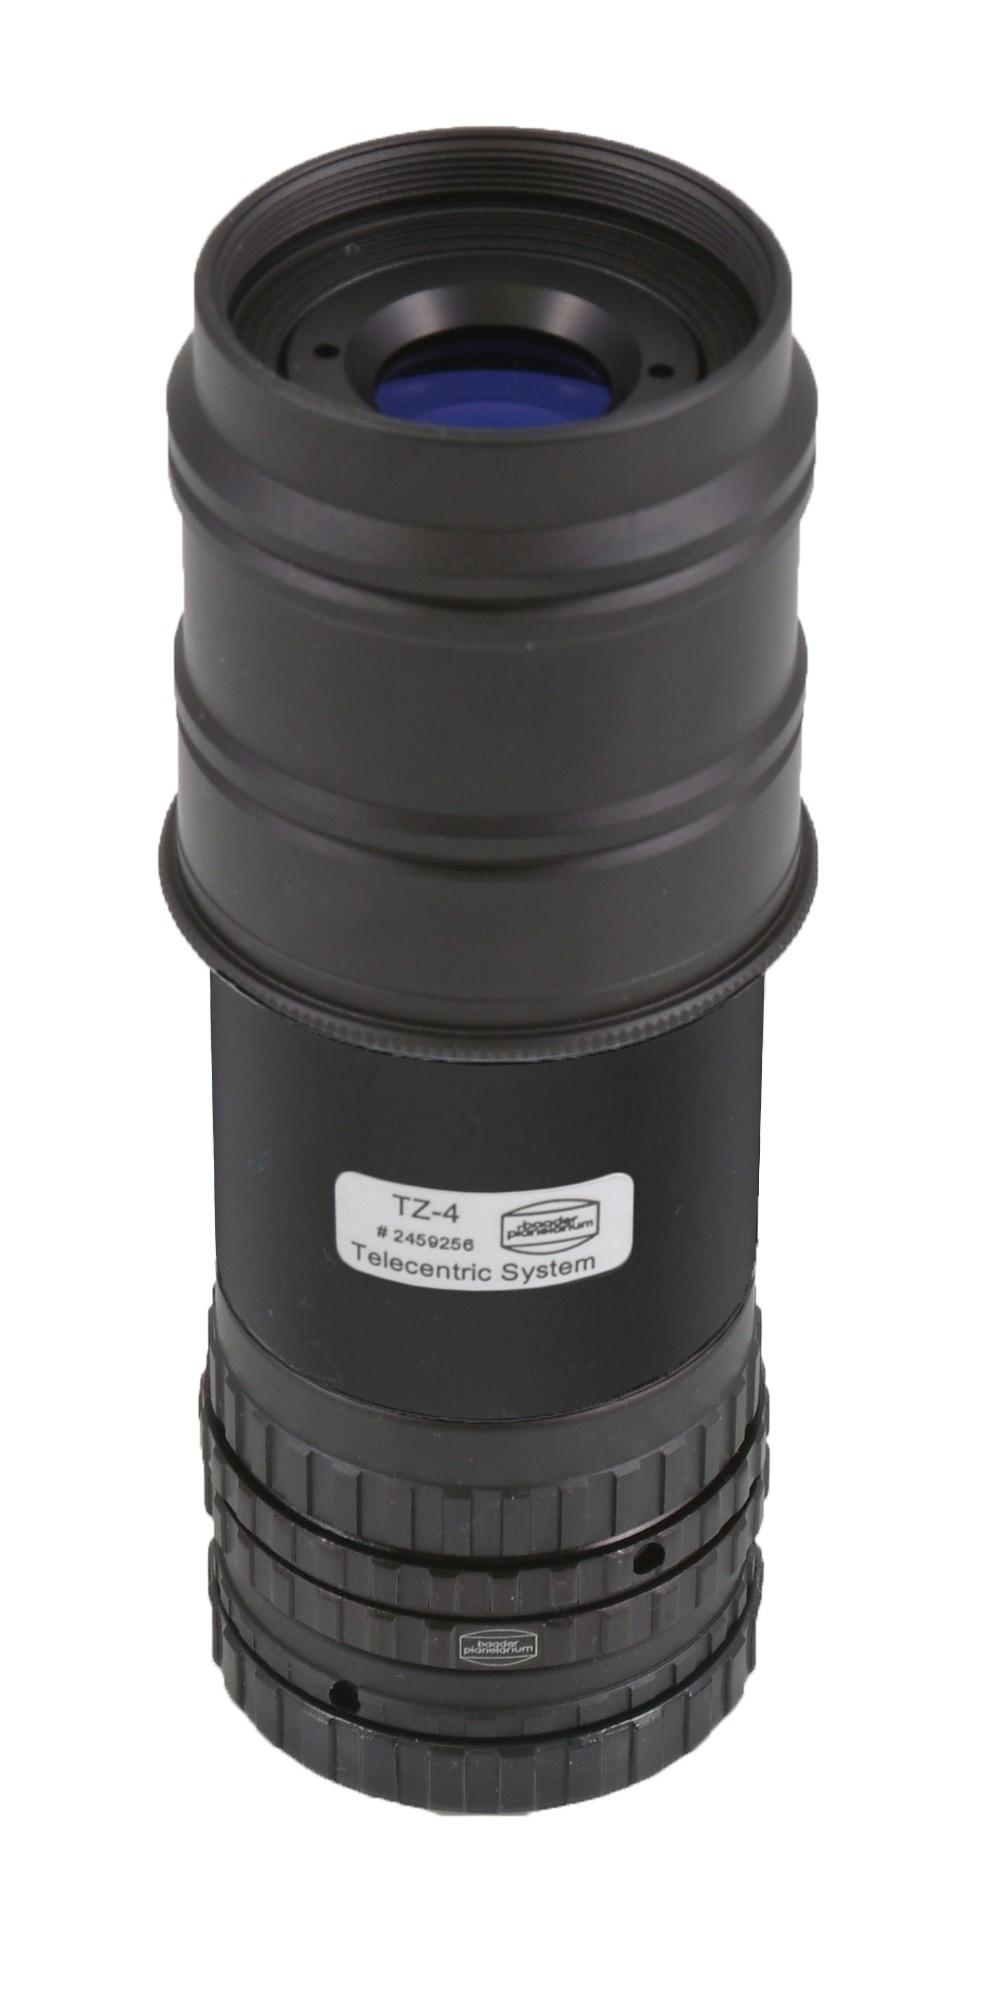 Telecentric System TZ-4 (4x focal length)